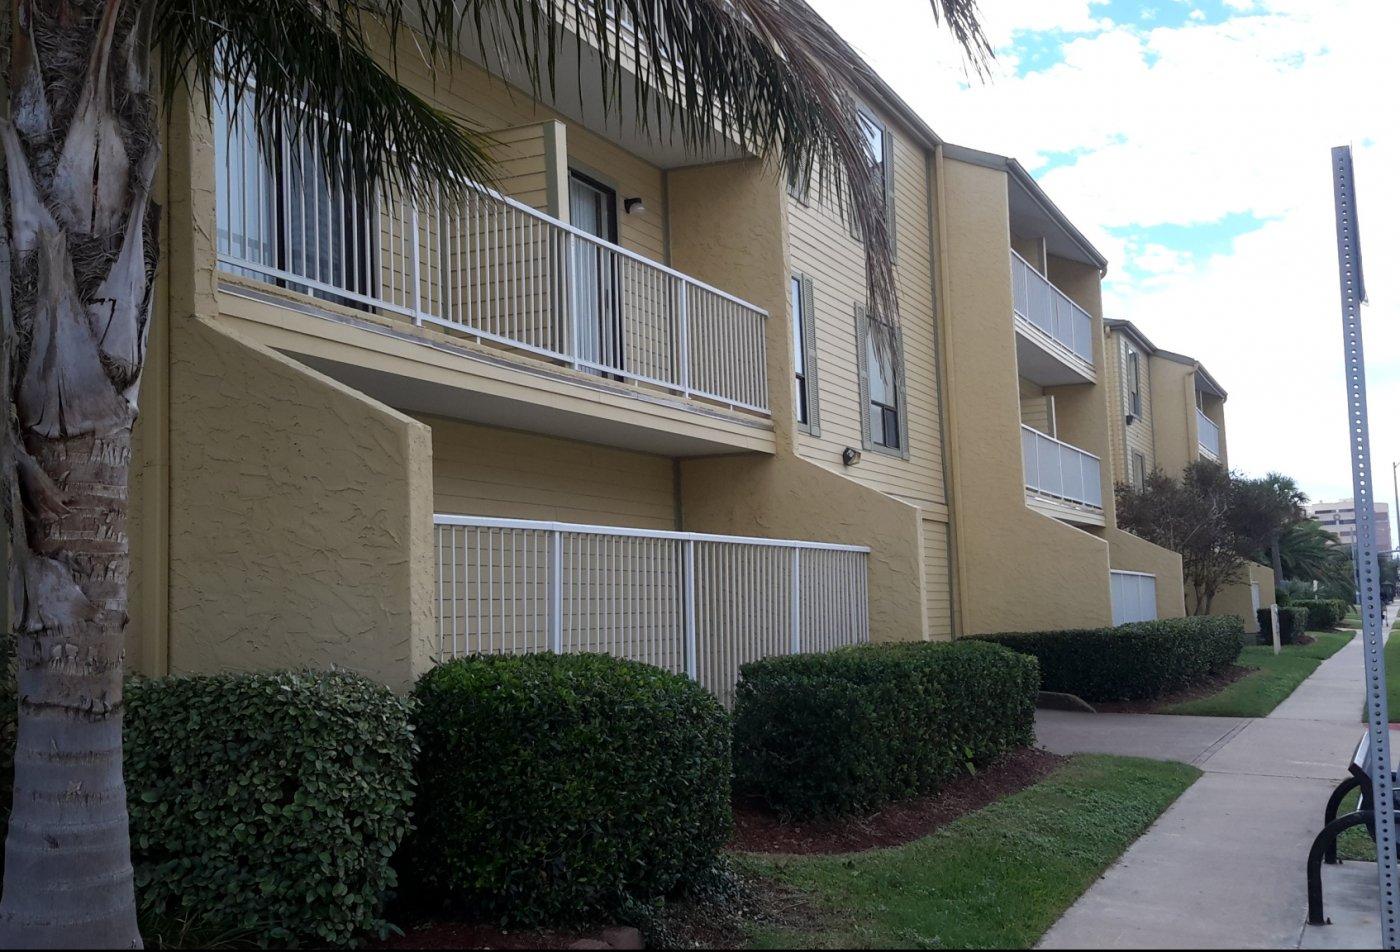 Carelton Courtyard Apartments